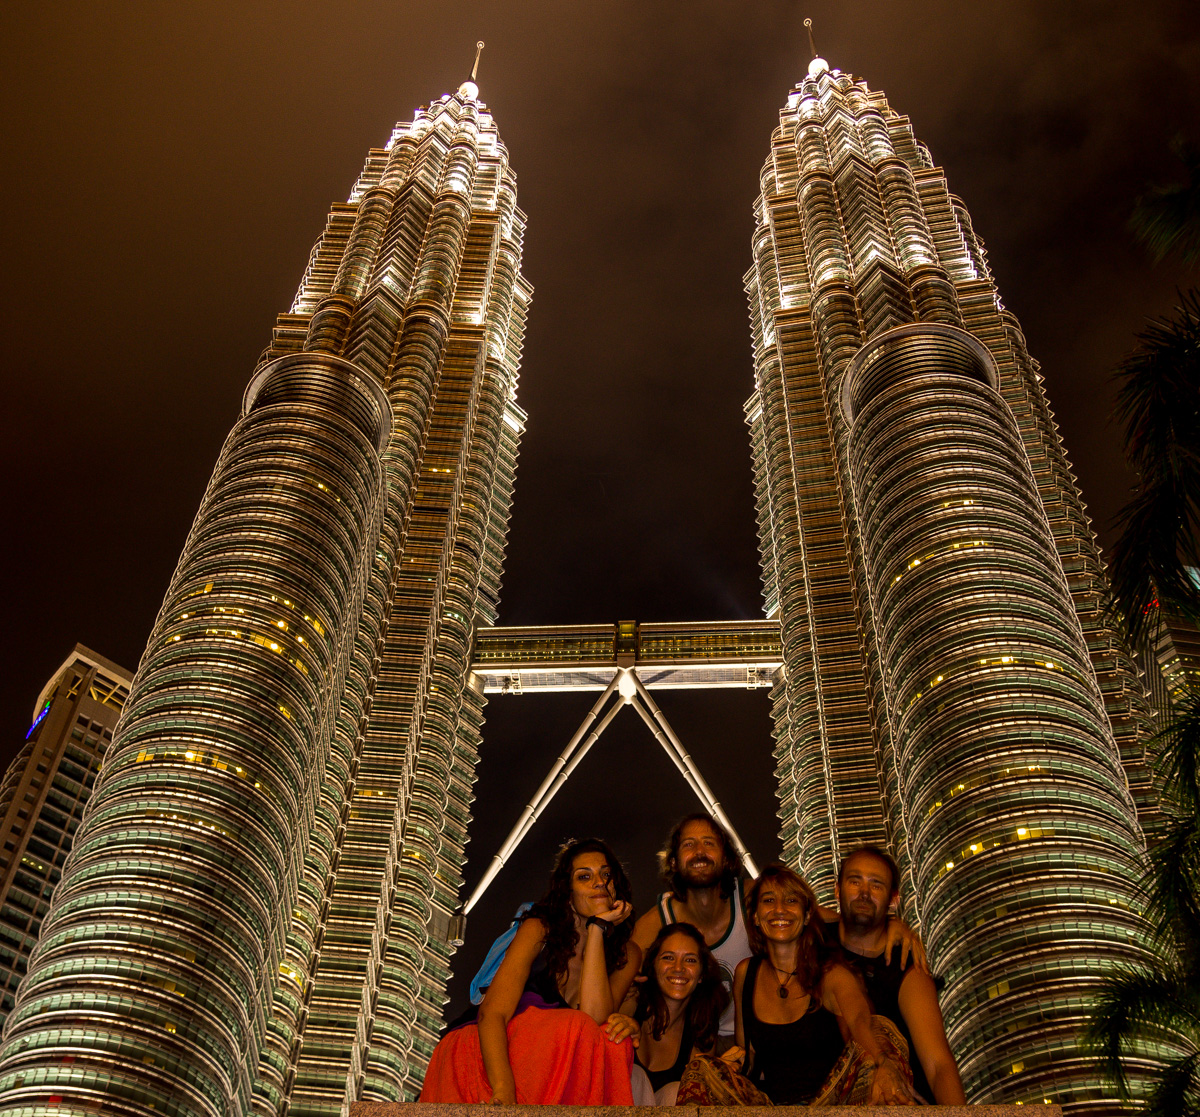 Foto de grupo, Torres Petronas, Kuala Lumpur